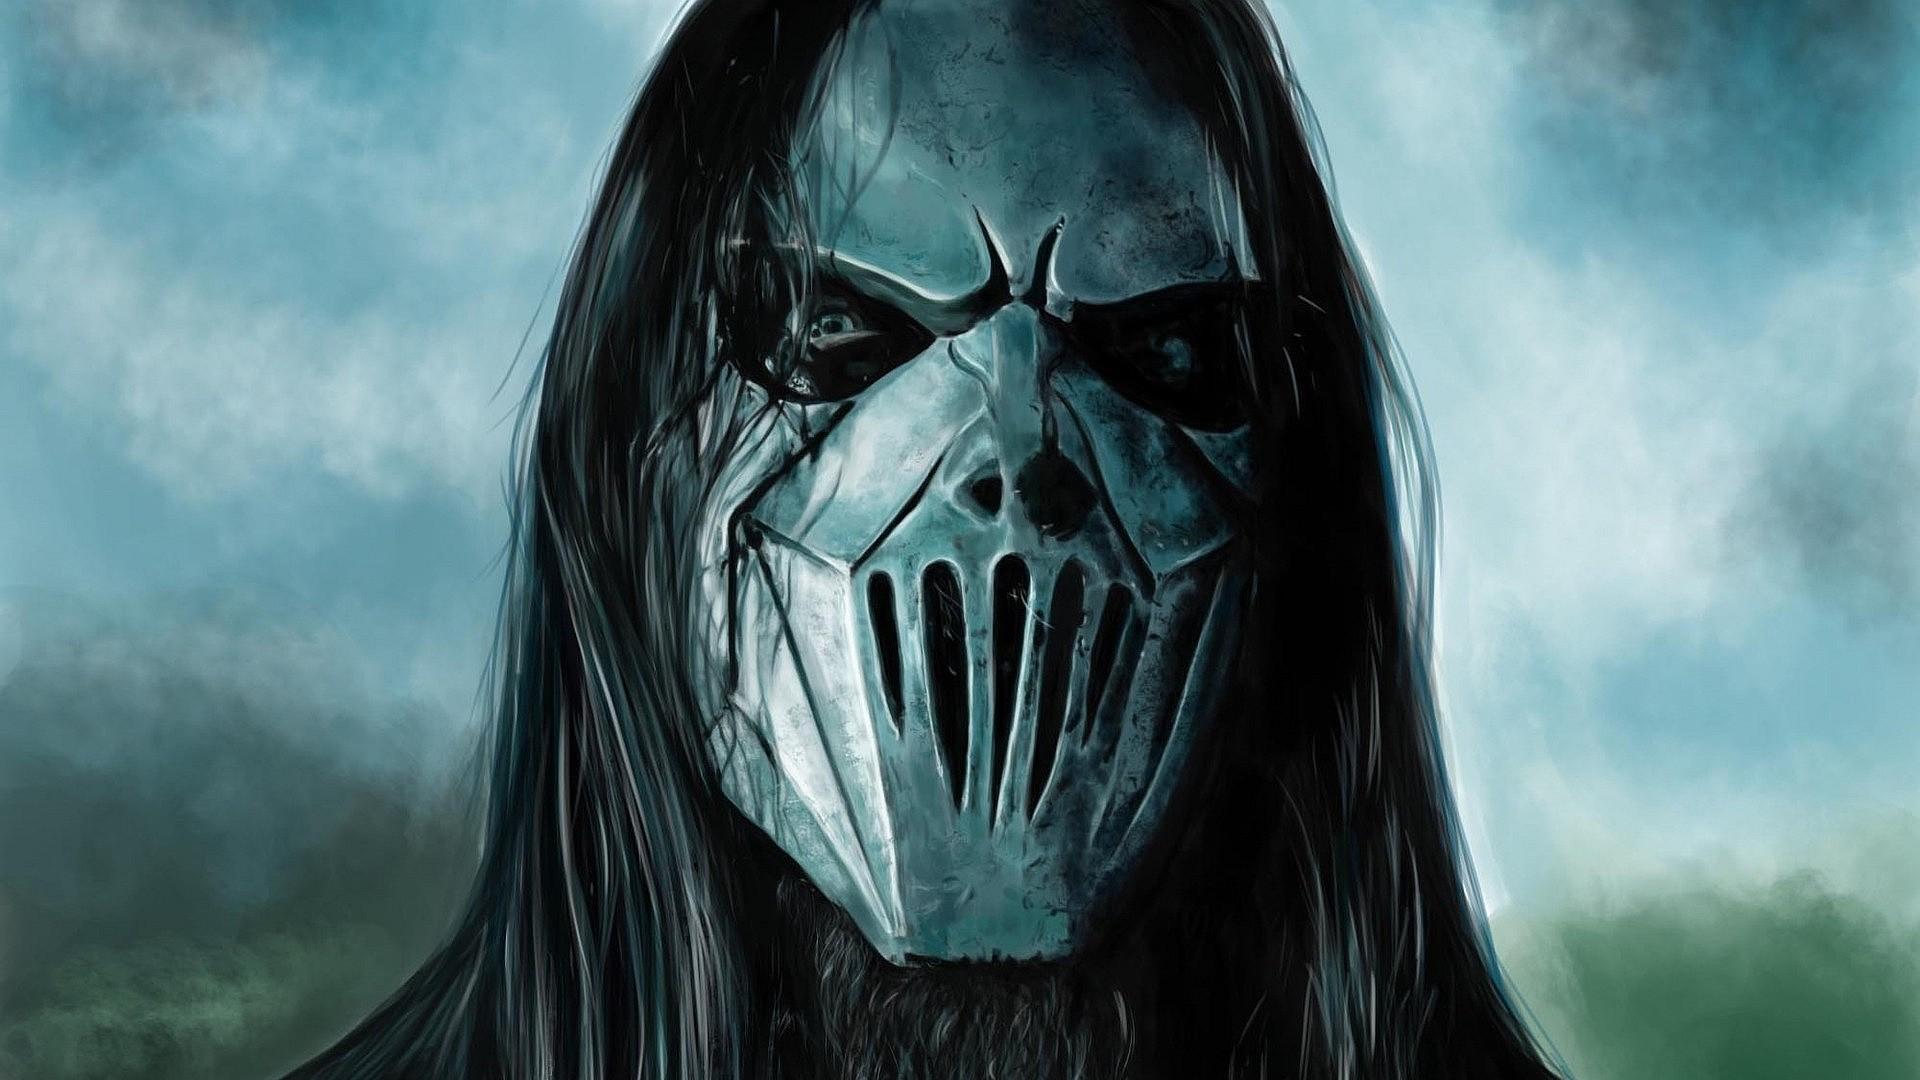 NU-Metal, Slipknot, маски, гитарист, Mick Thomson - обои ...: http://www.zastavki.com/rus/Celebrities/Male_Celebrity/wallpaper-38483.htm